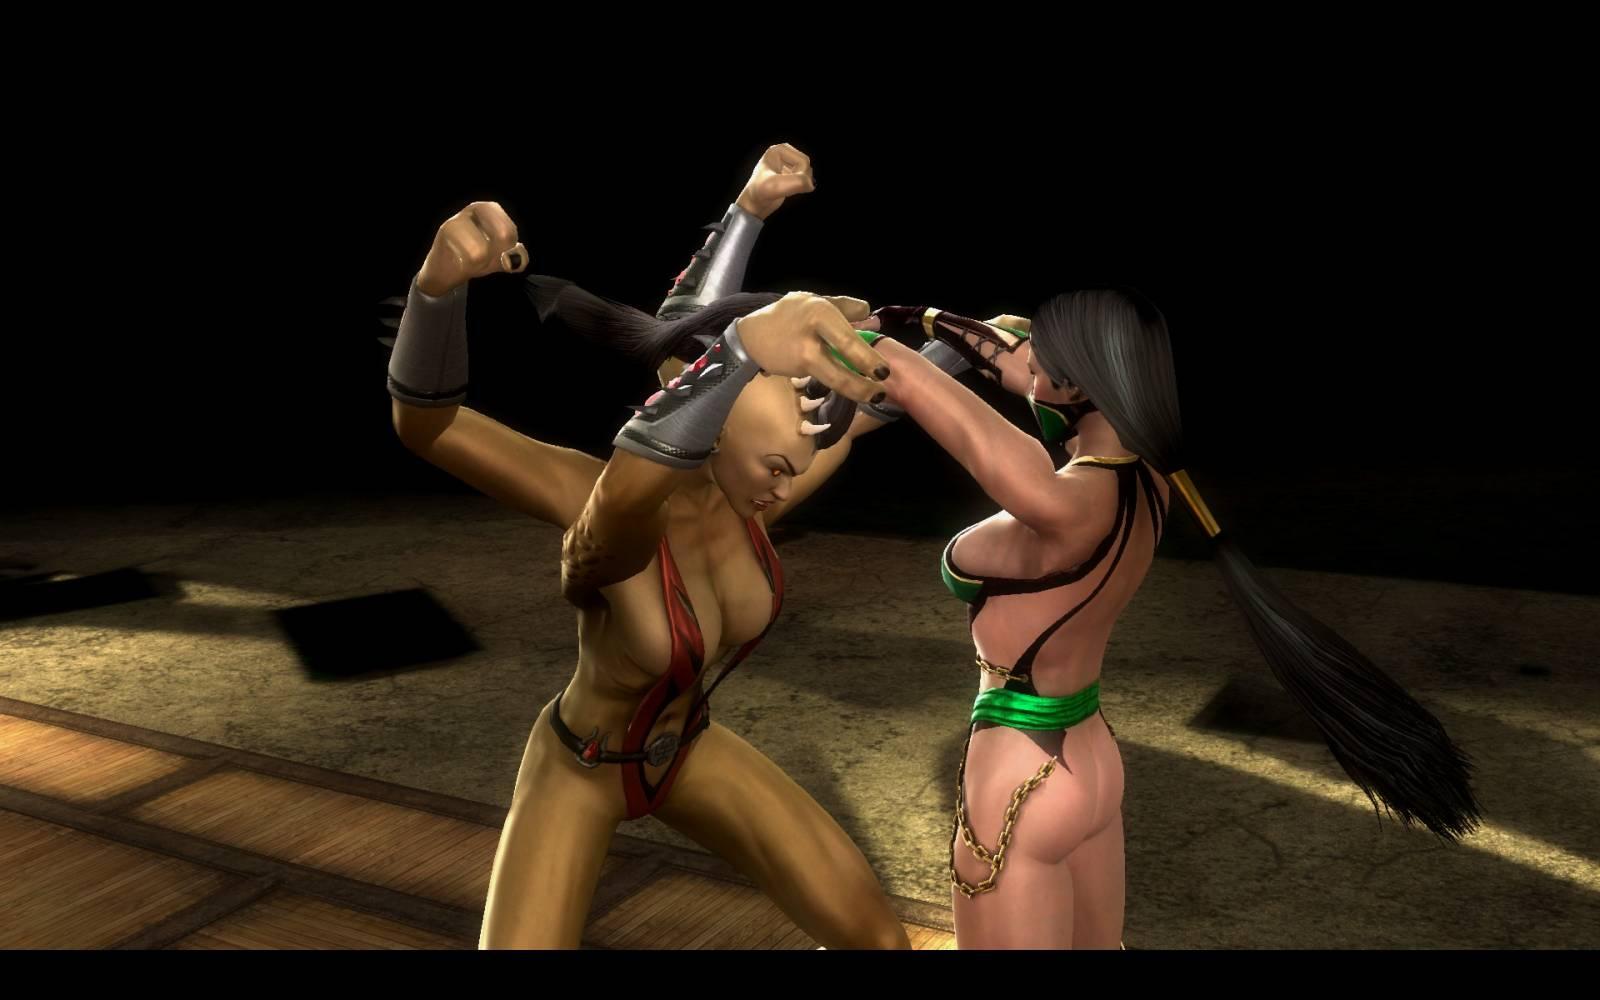 Mortal kombat komplete nude patch naked galleries